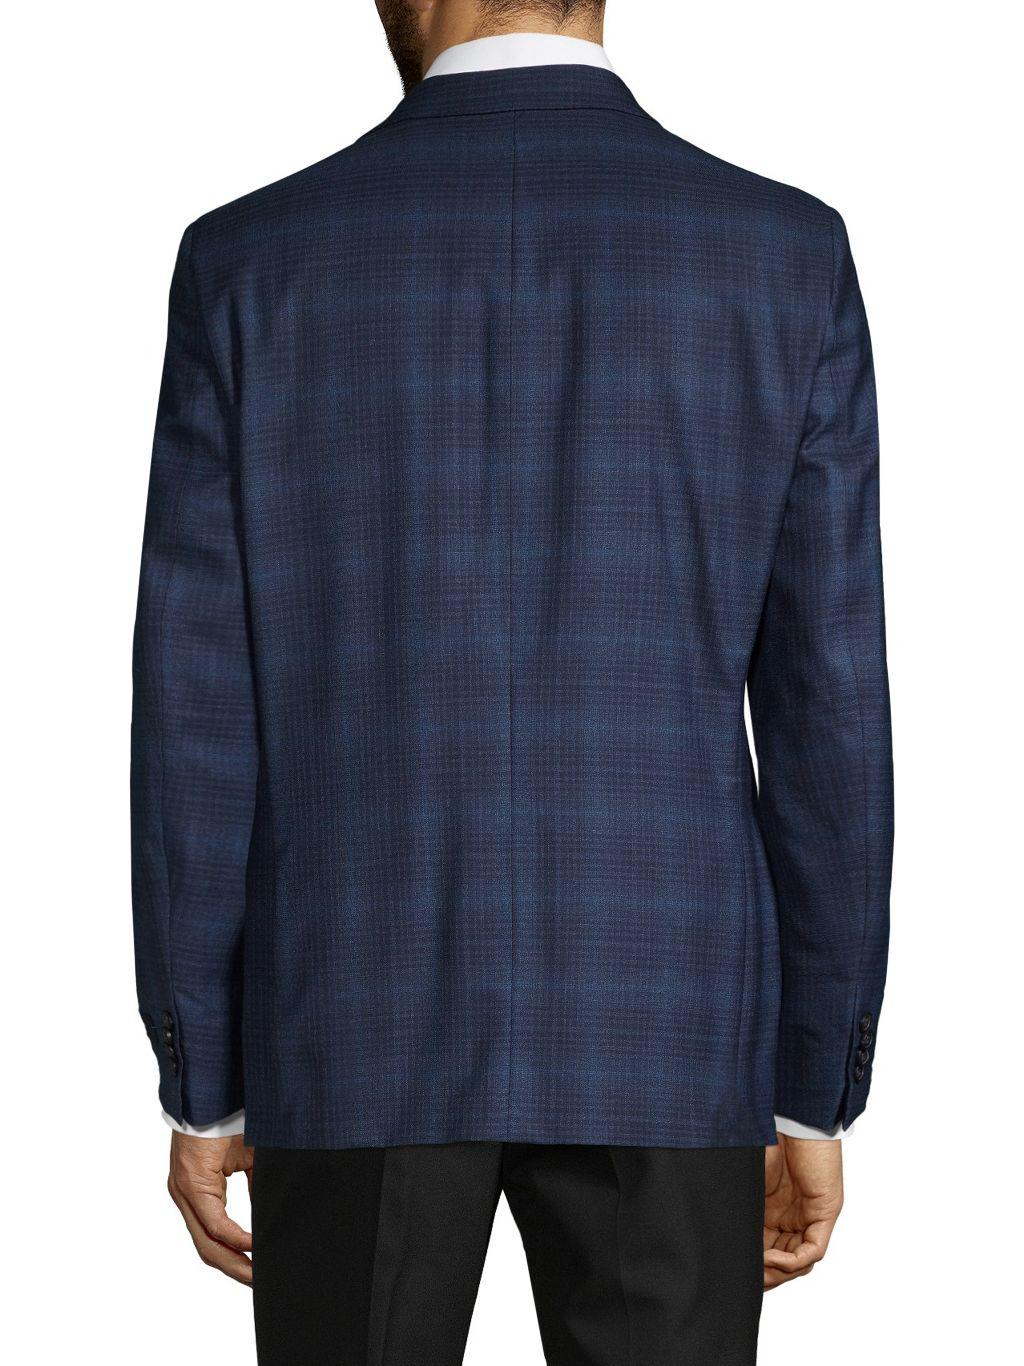 Tommy Hilfiger Stretch-Fit Plaid Wool-Blend Sportcoat